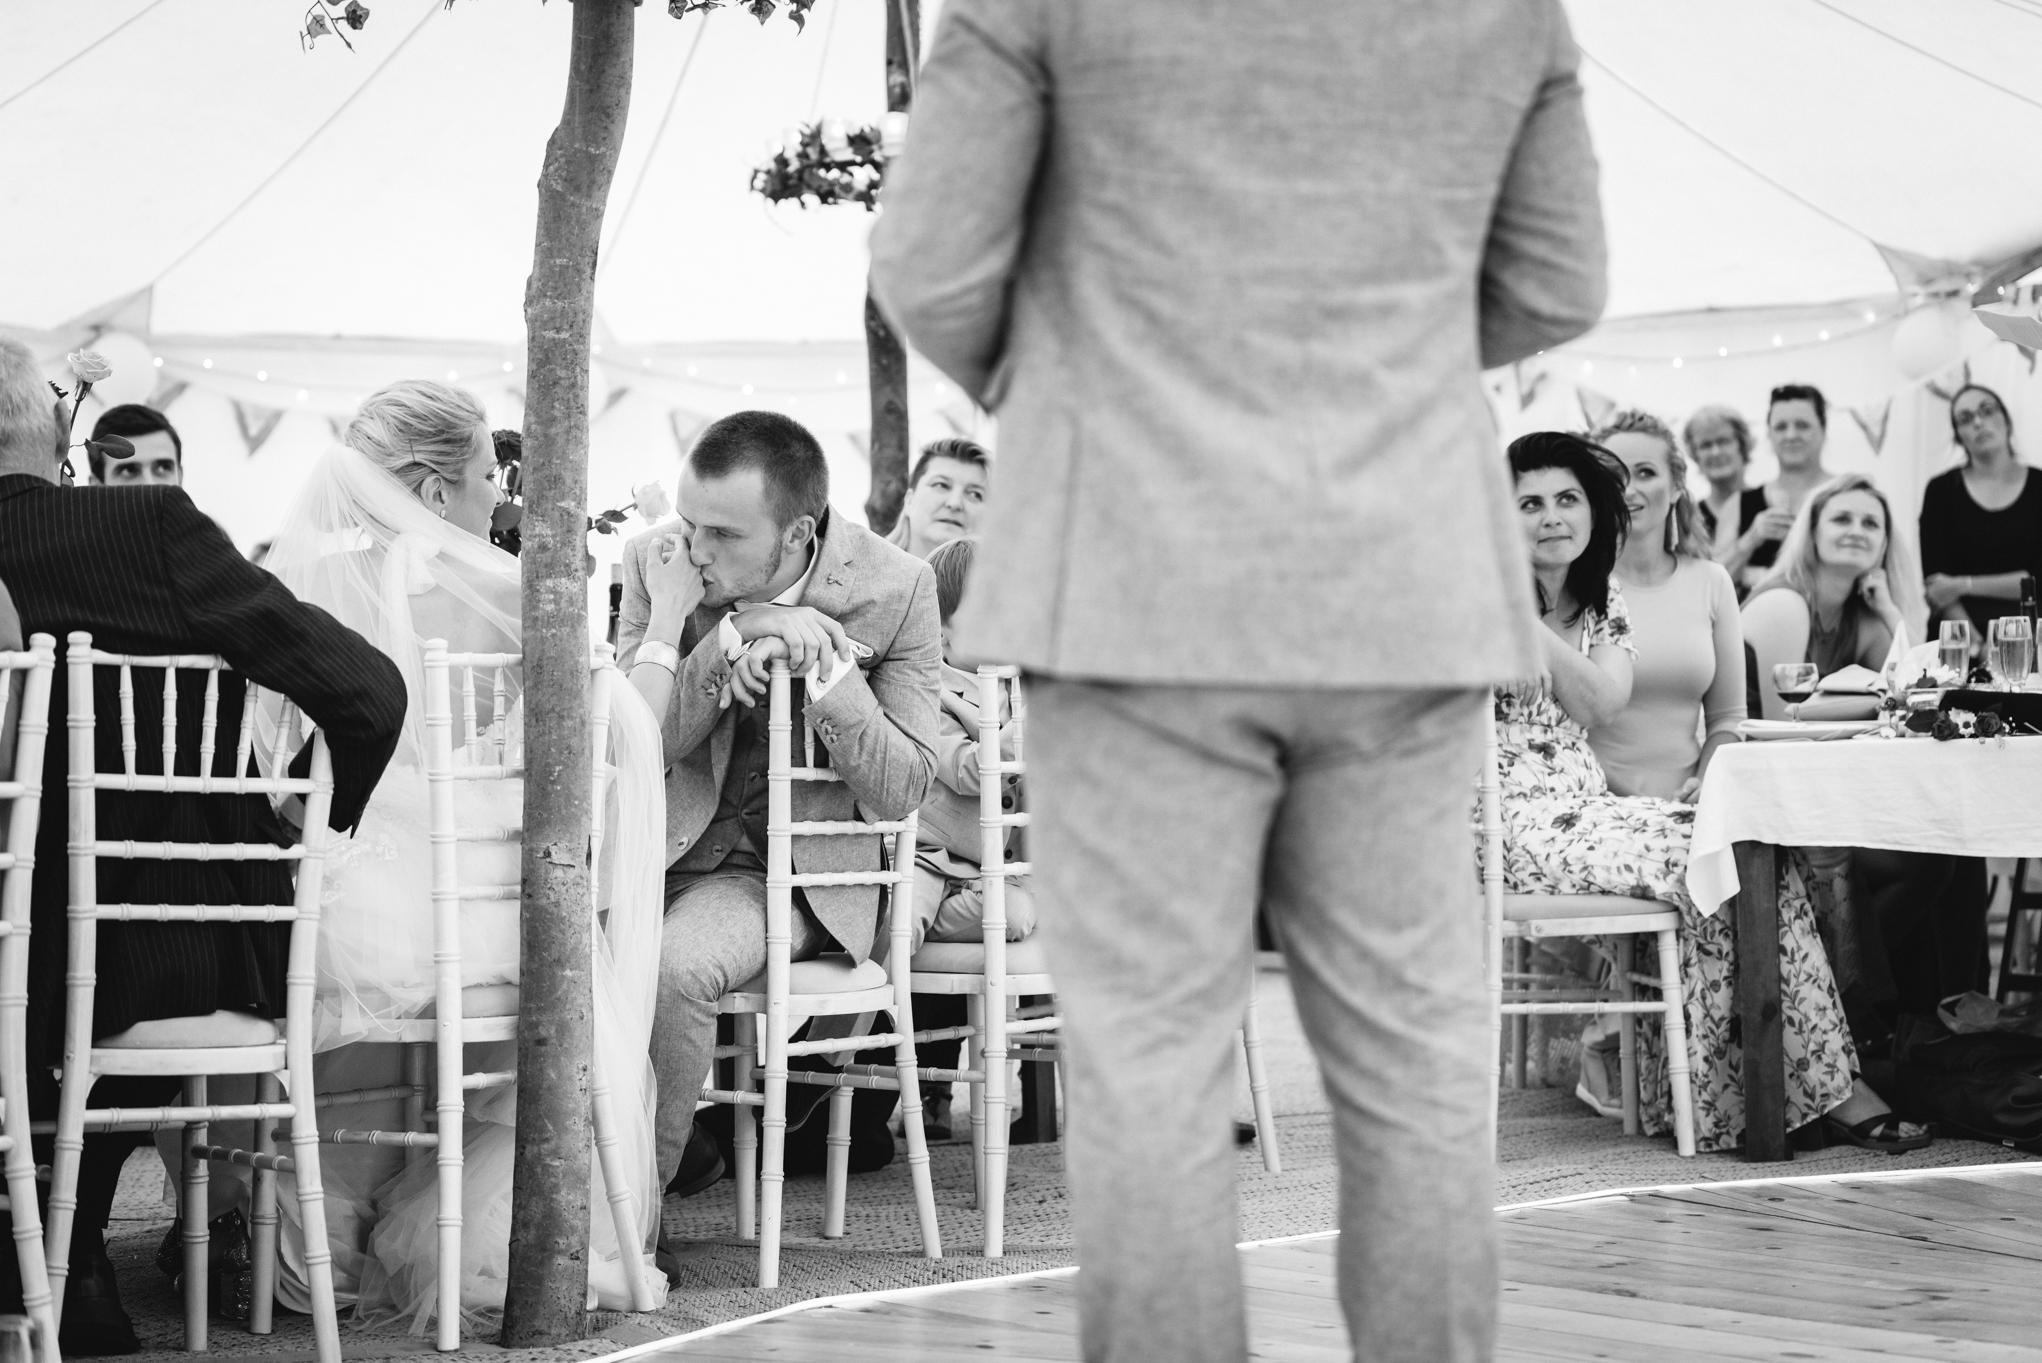 Copy of Groom Kissing Brides Hand